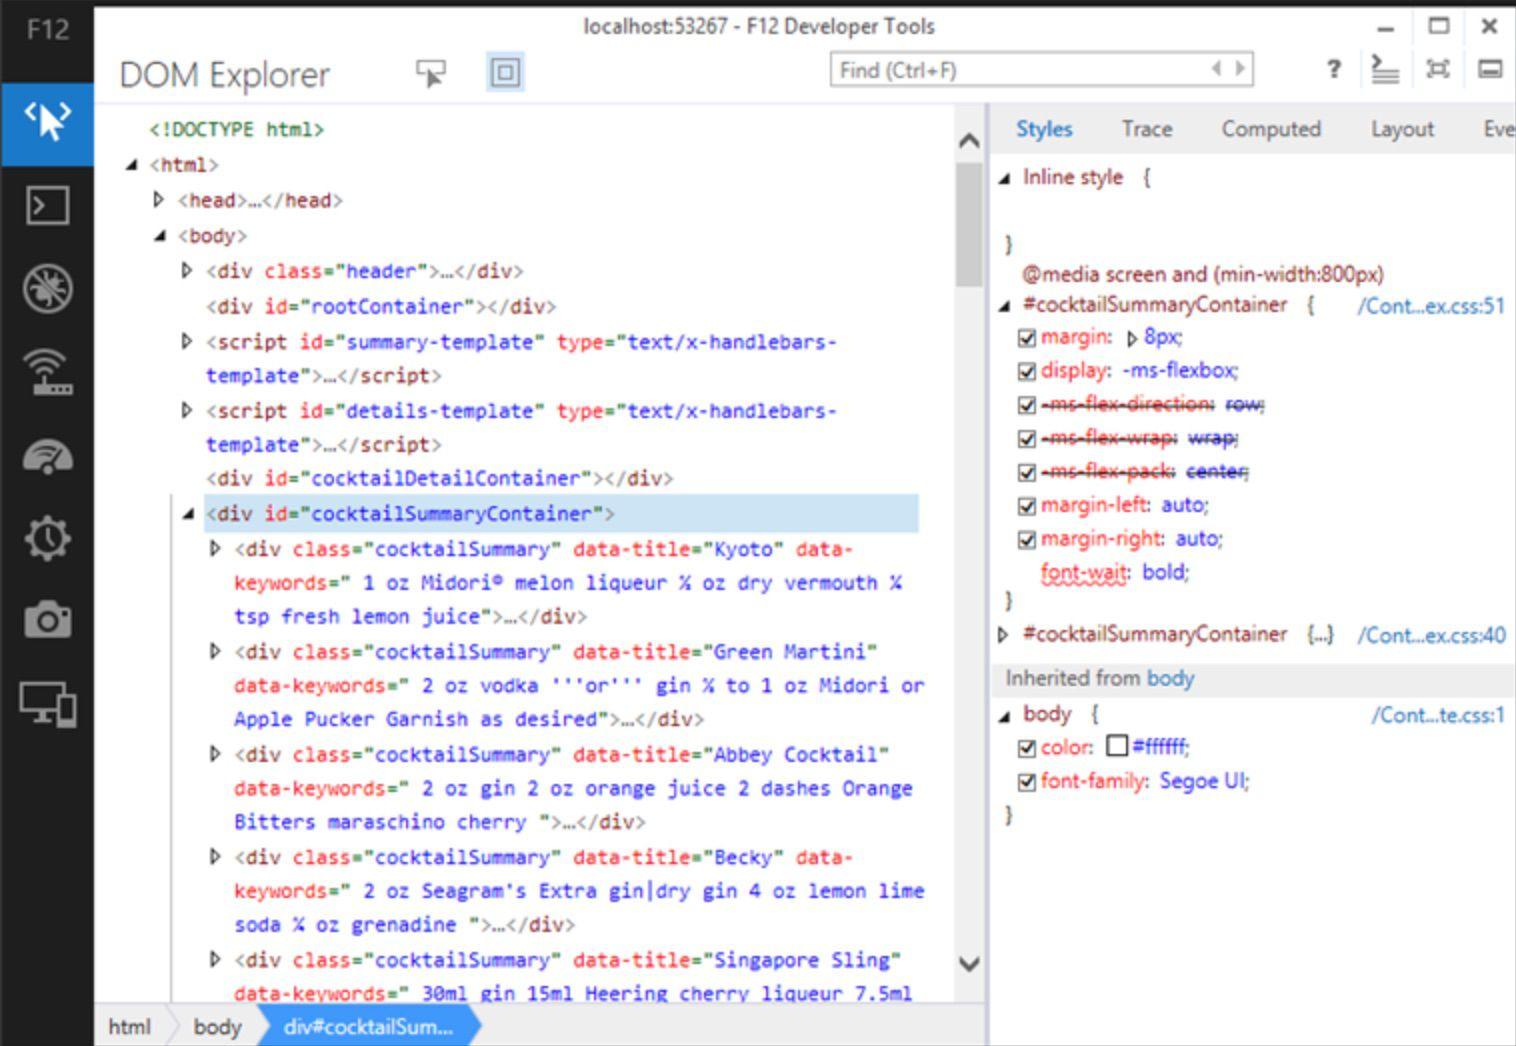 Inspect web elements in Internet Explorer